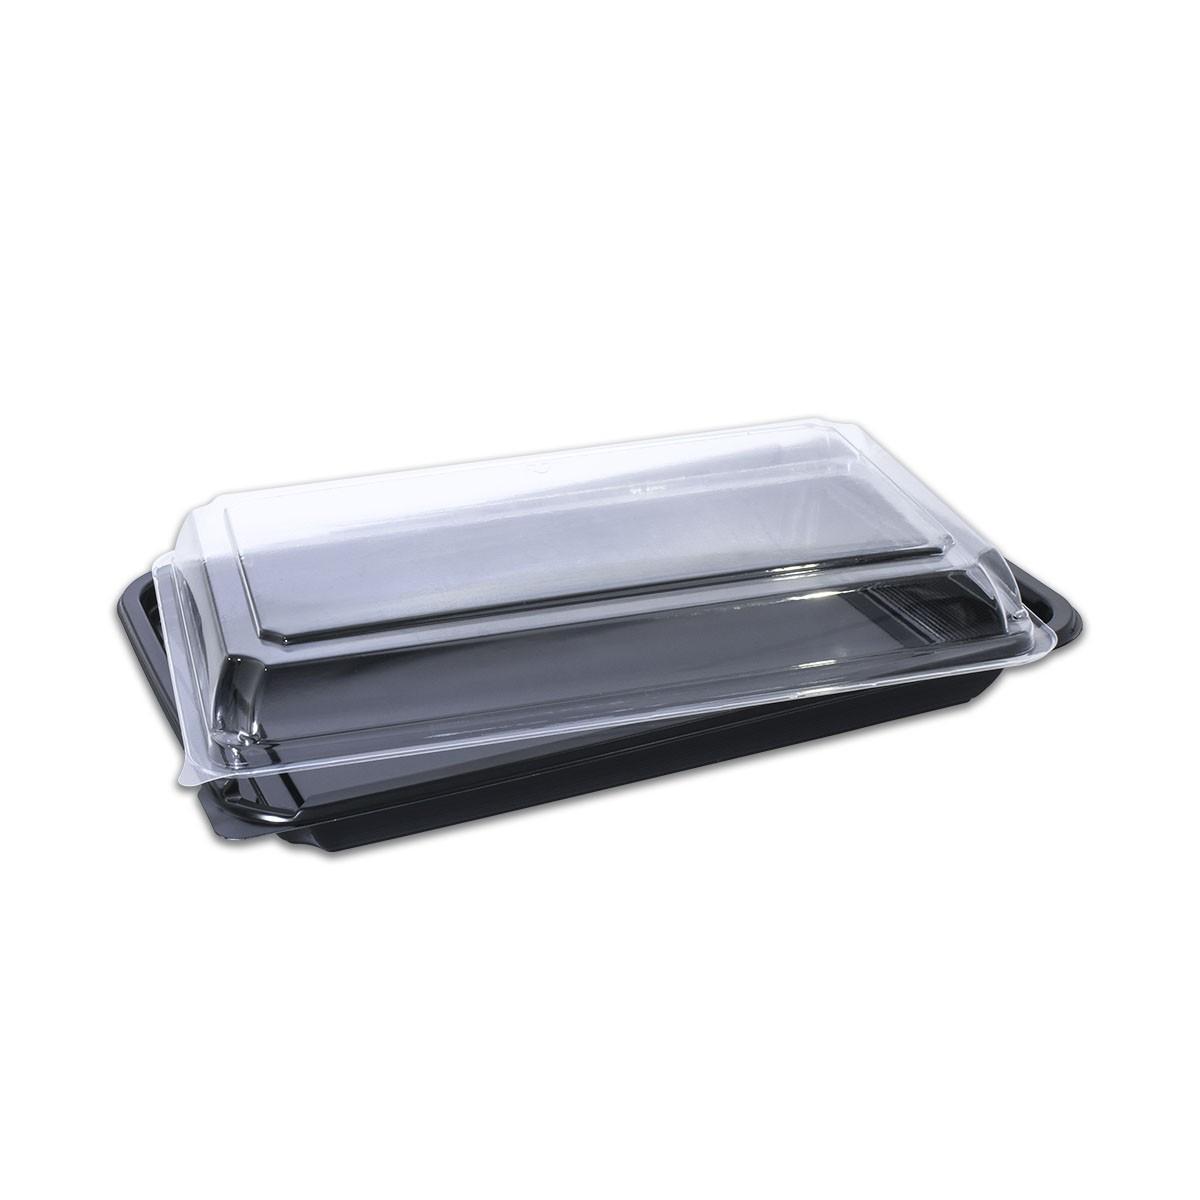 Tuttiblac Black Rectangular Container 251x158x50mm +Lid | 300pcs